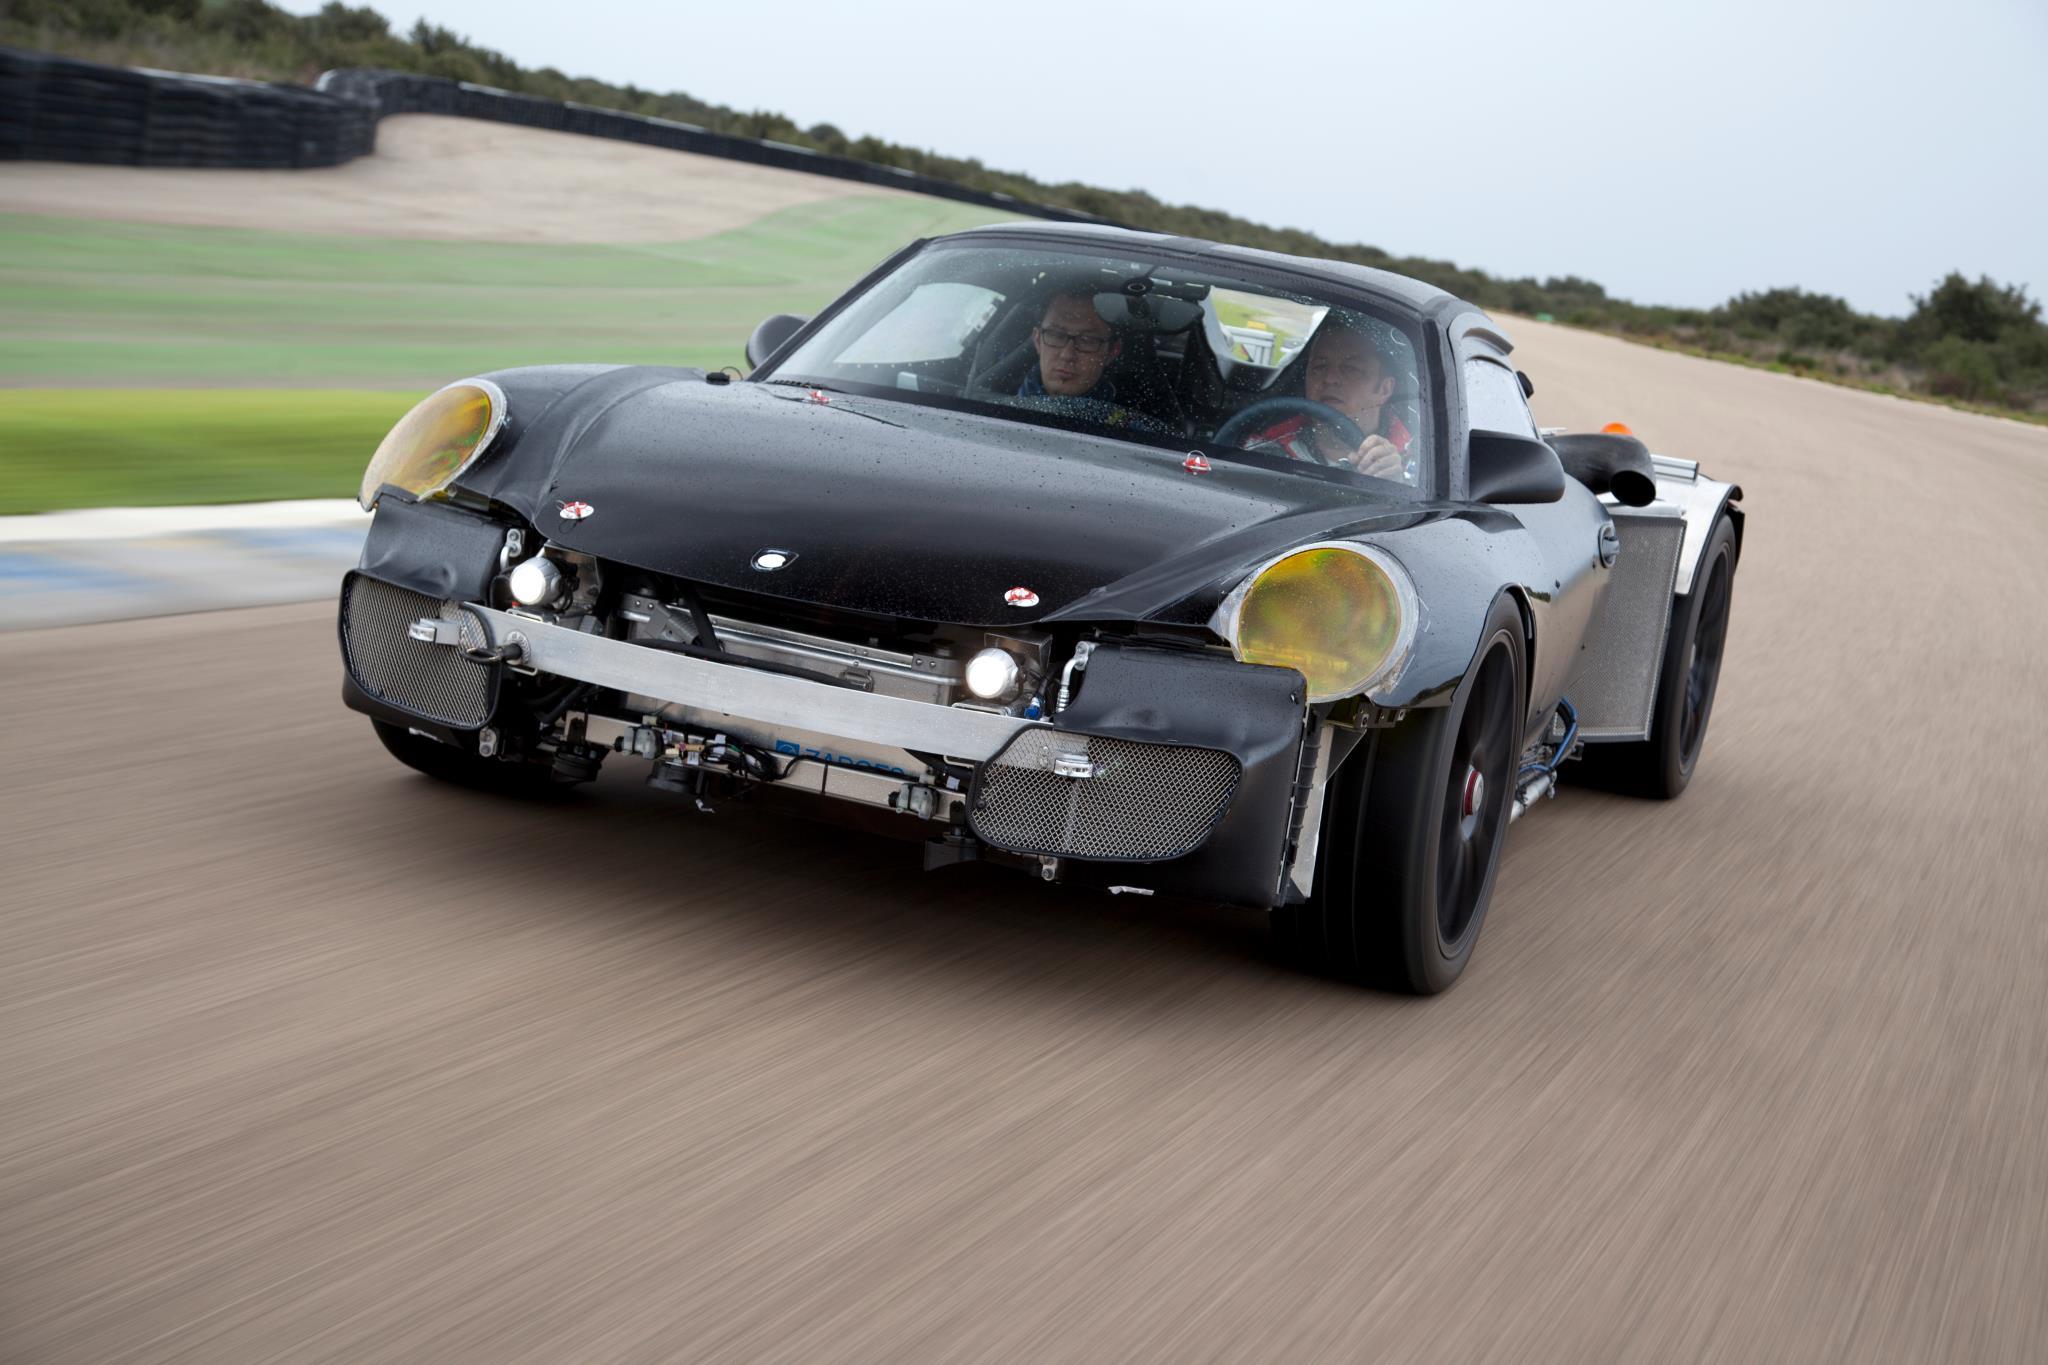 Porsche-918-Spyder-test-drive-Nardo